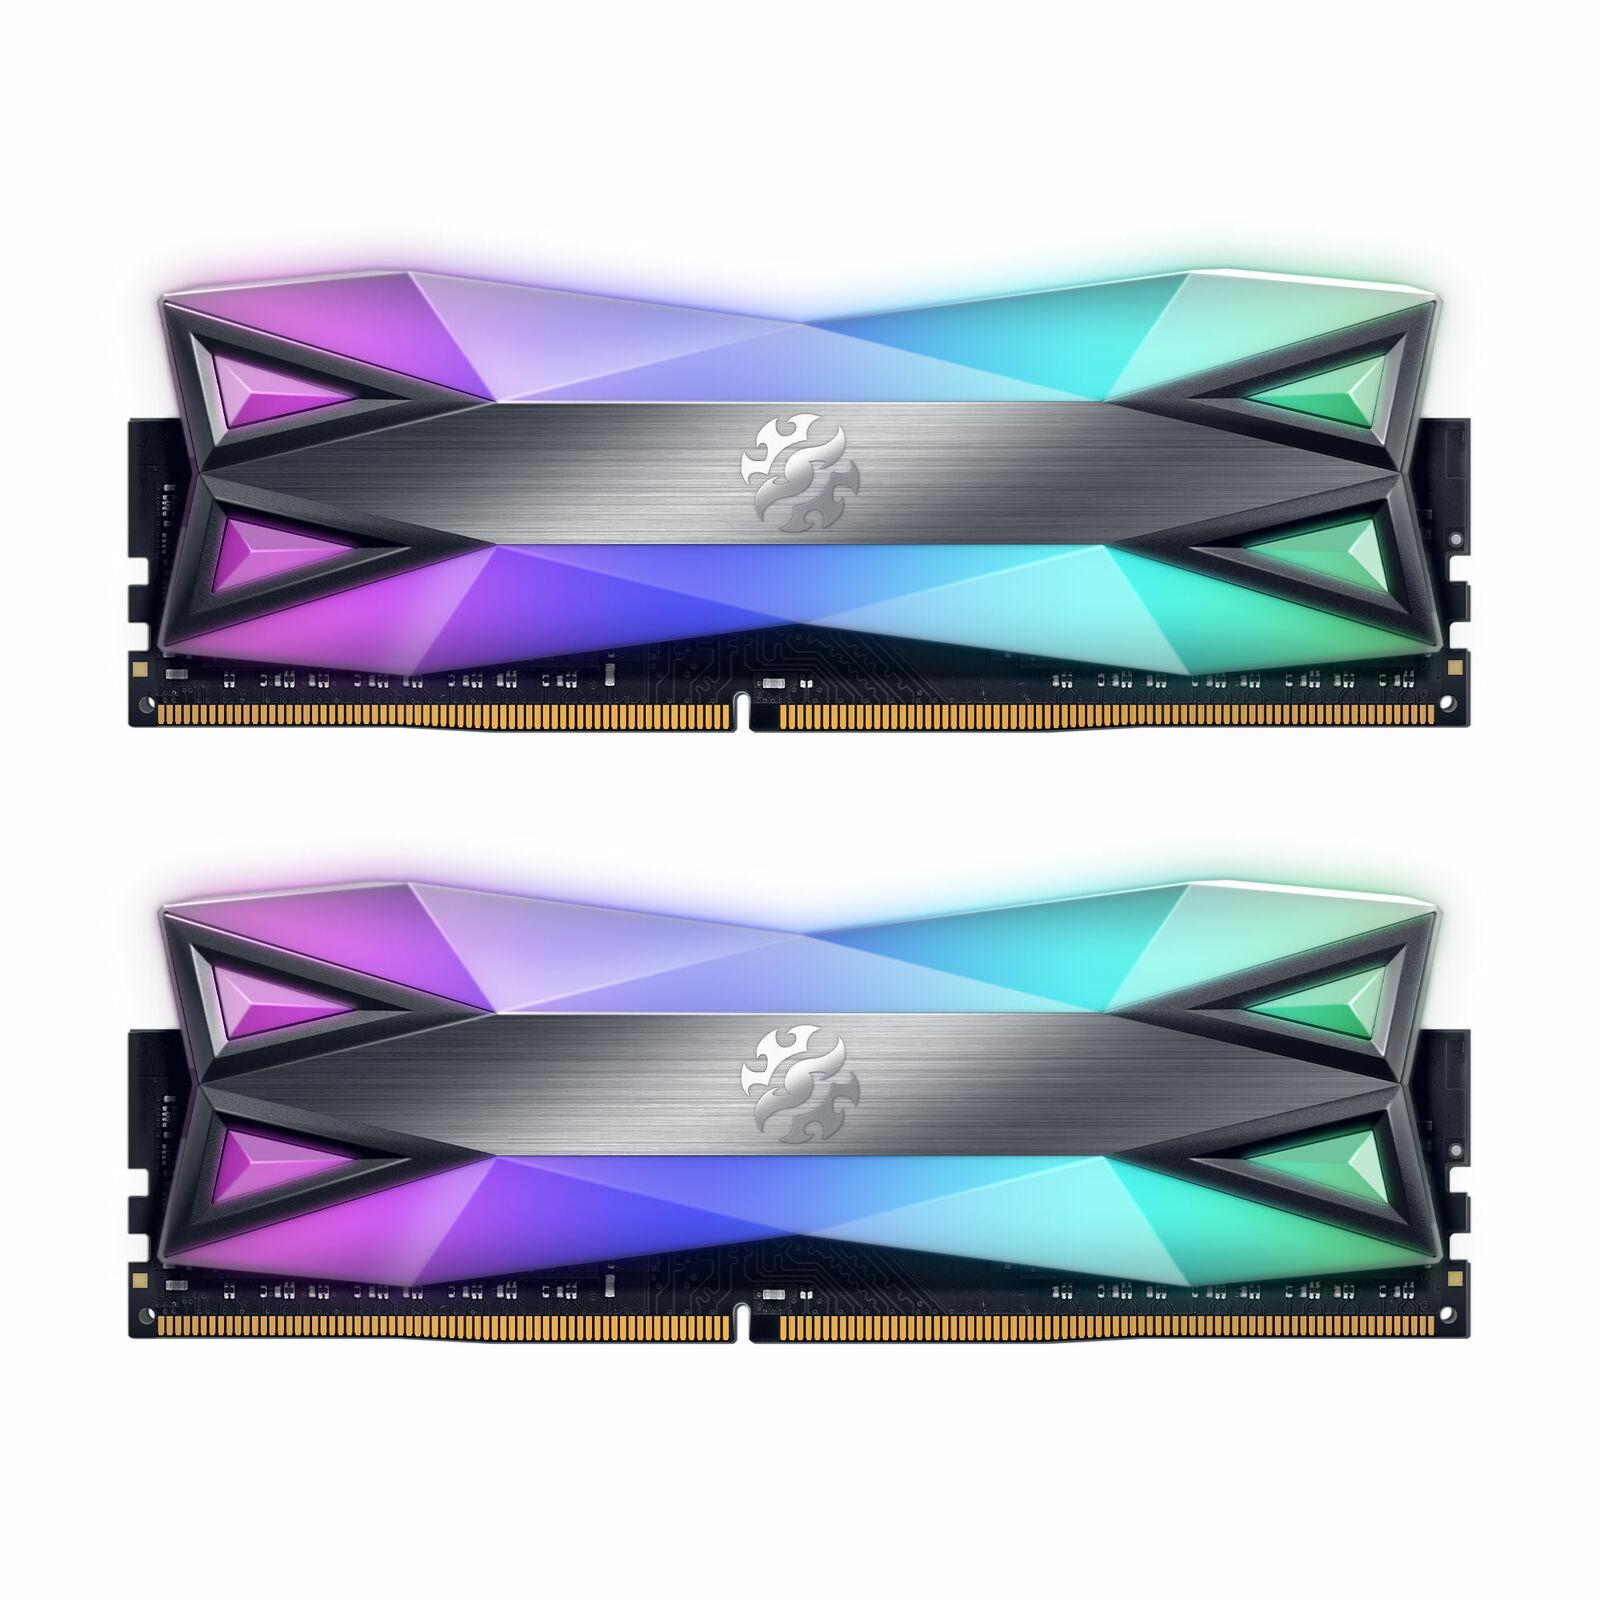 XPG SPECTRIX D60G RGB Desktop Memory: 16GB (2x8GB) DDR4 3600MHz CL14 GREY. Buy it now for 185.99